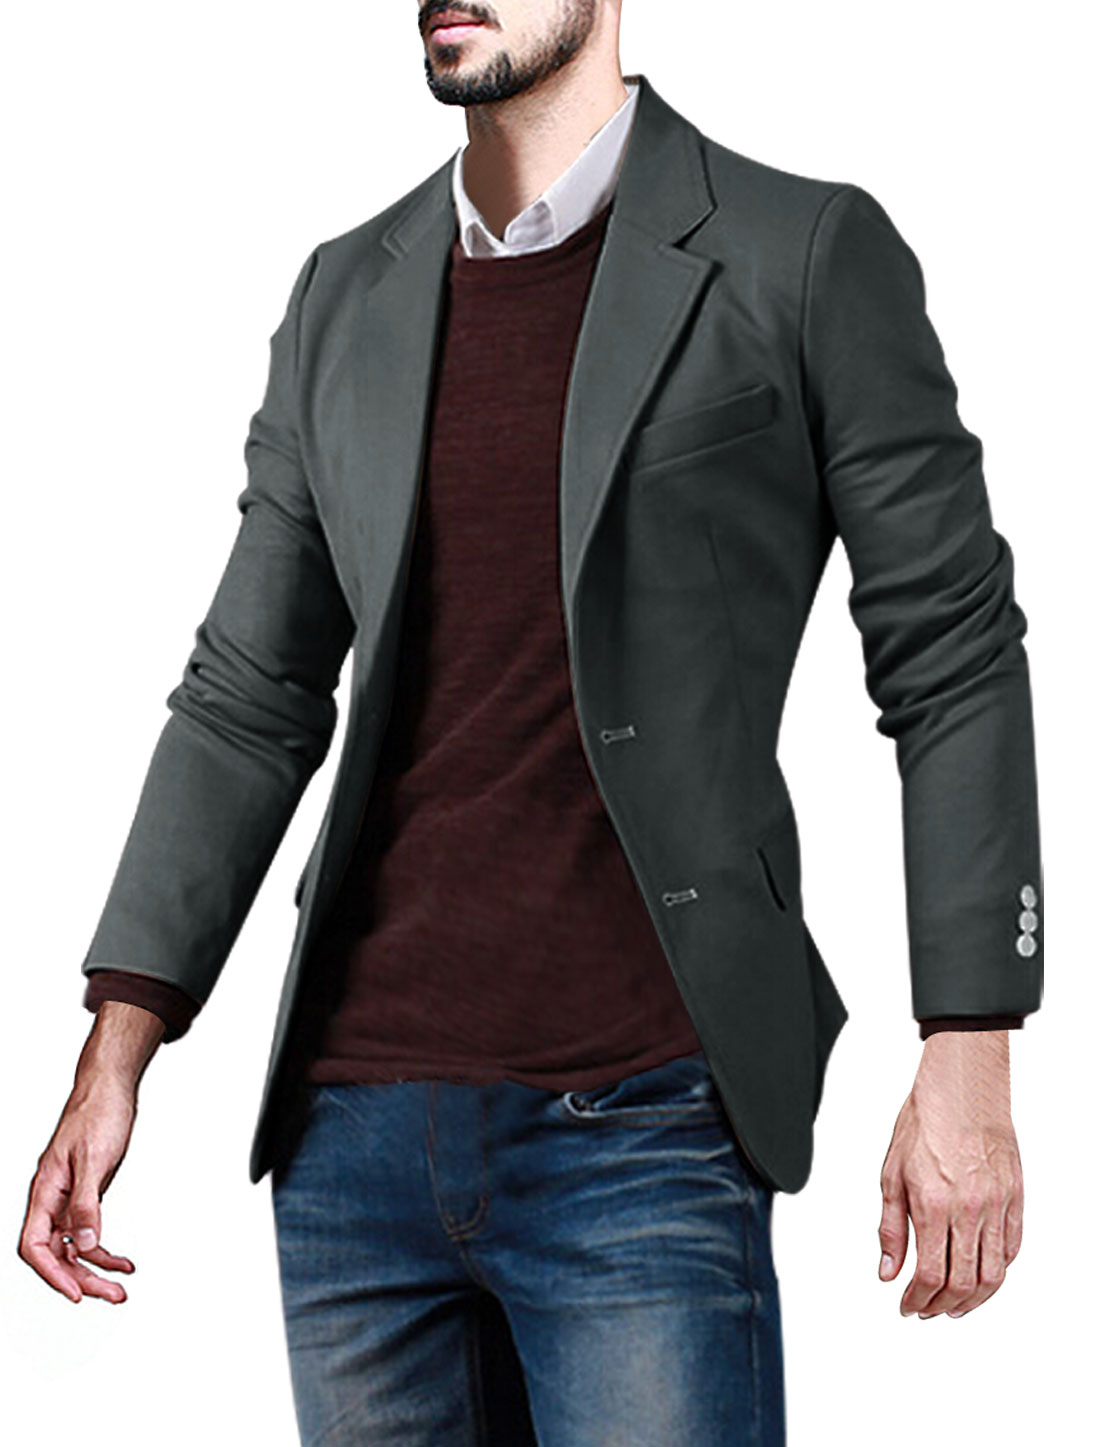 Men Notched Lapel Three Pockets Button Closed Slim Fit Blazer Gray M